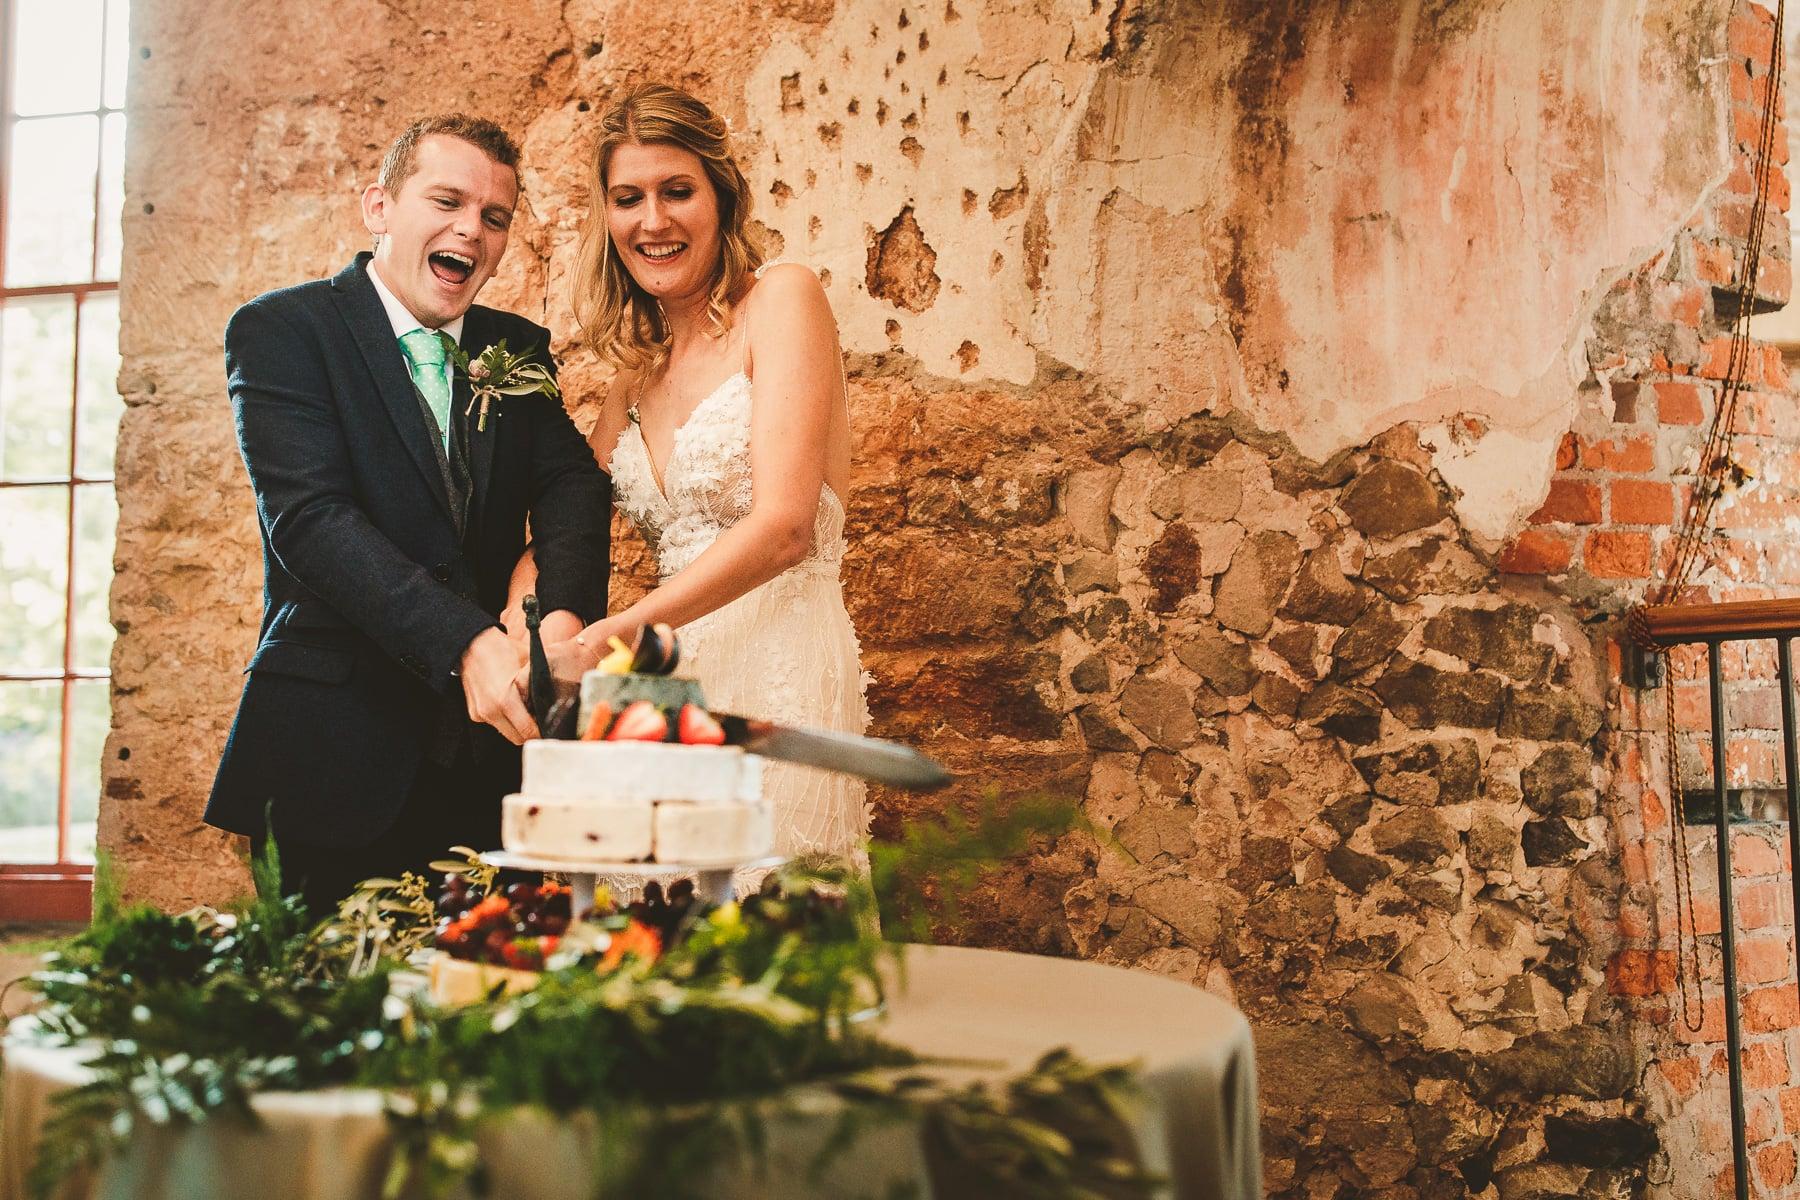 Wedding-cake-cutting-Lulworth-Castle-Dorset